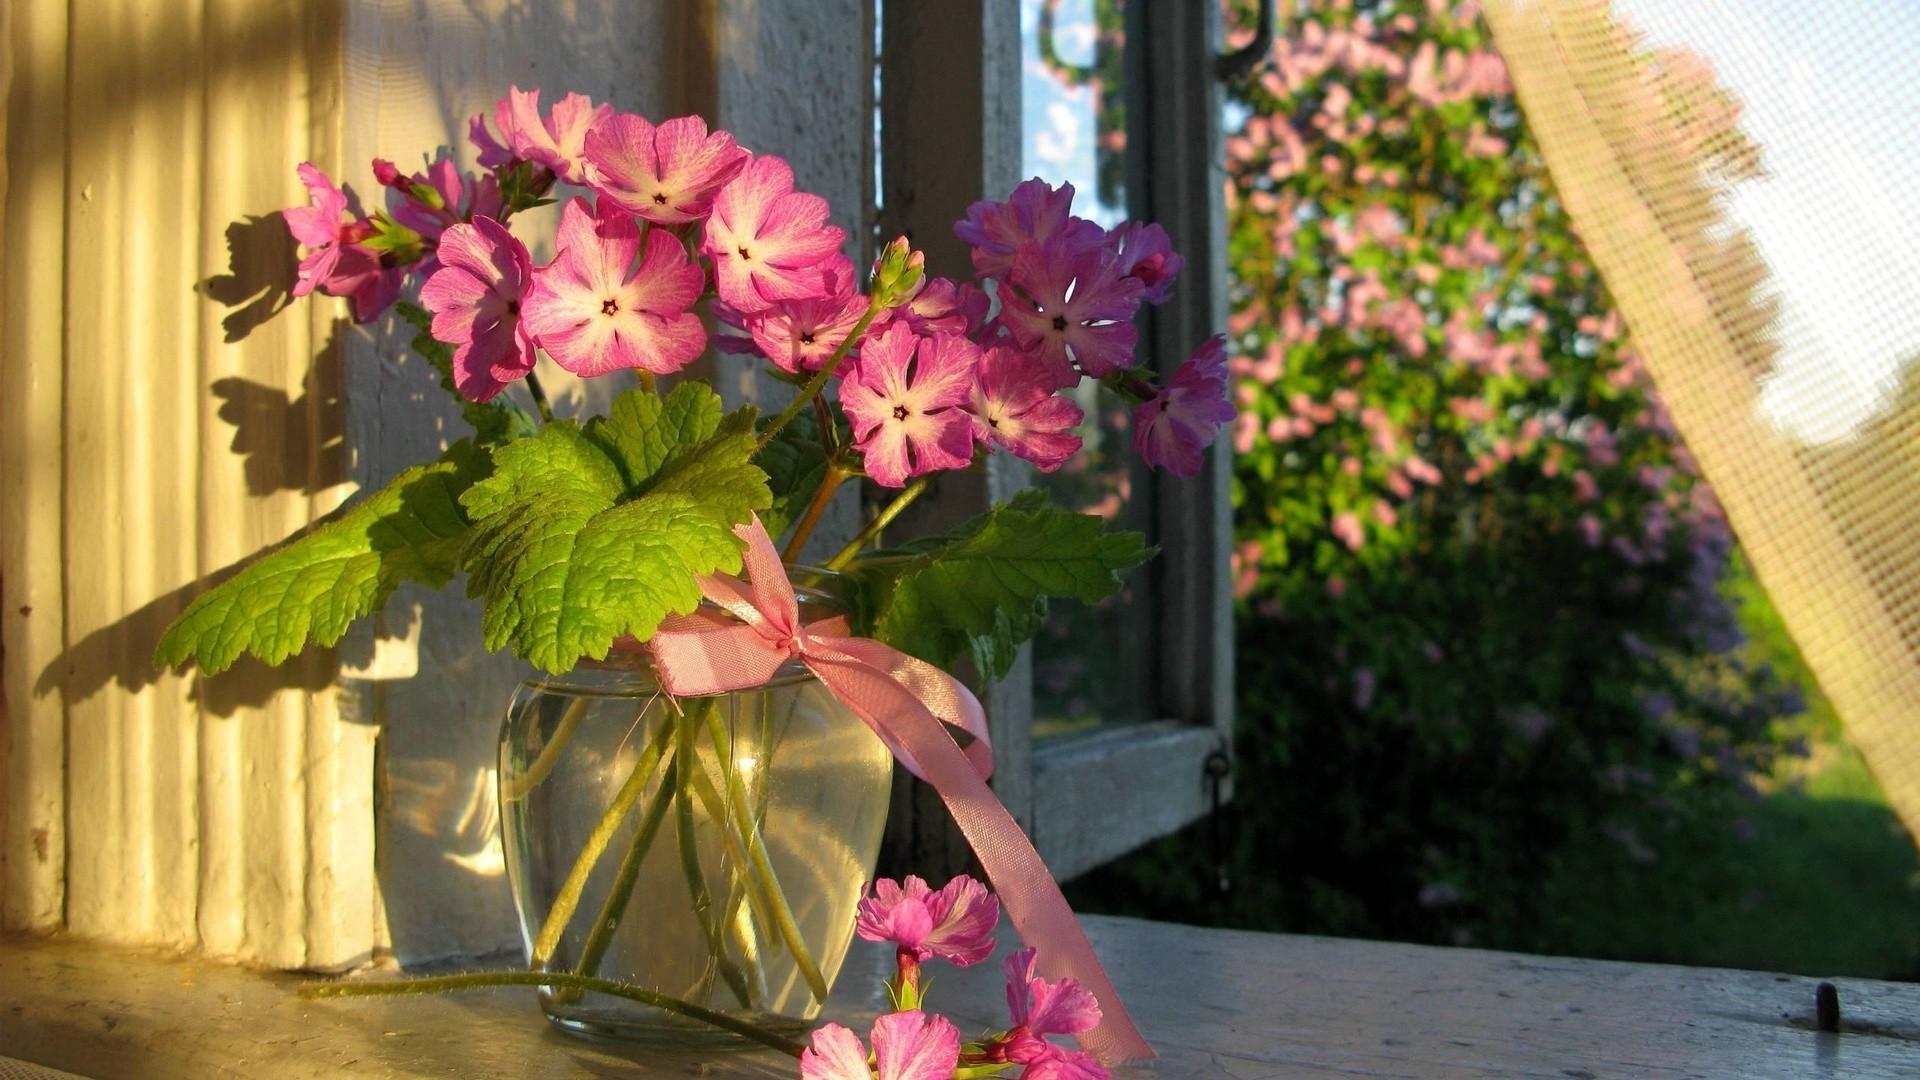 Bouquet of flowers in a glass vase desktop wallpapers 1600x9.